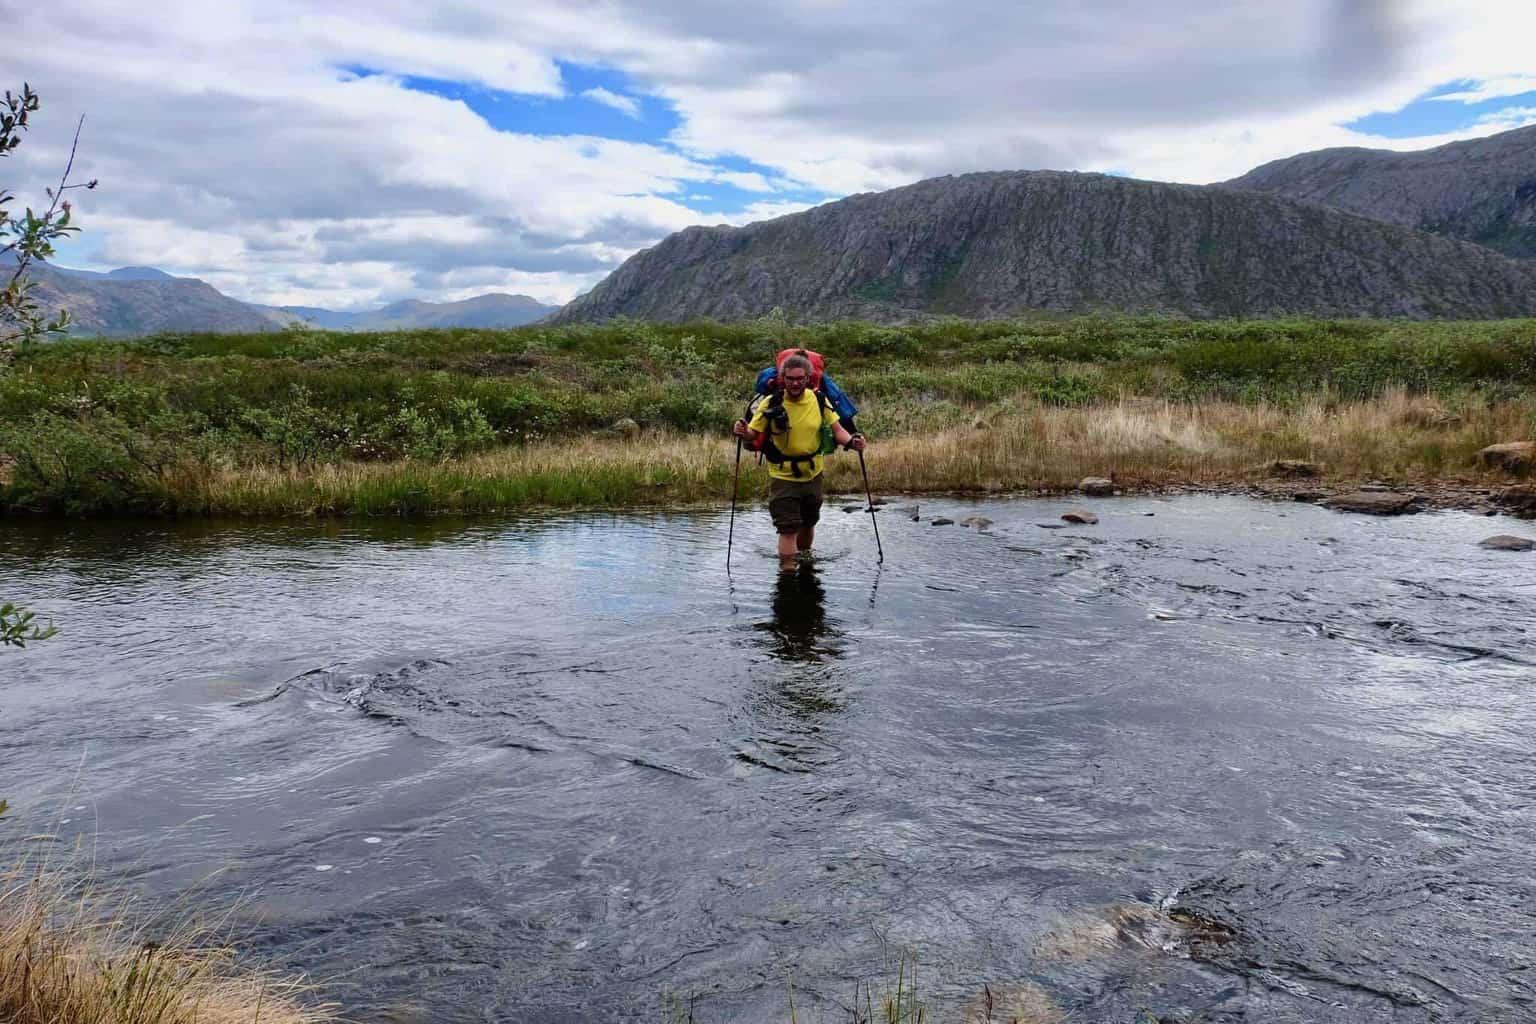 Arctic Circle Trail greenland river crossing